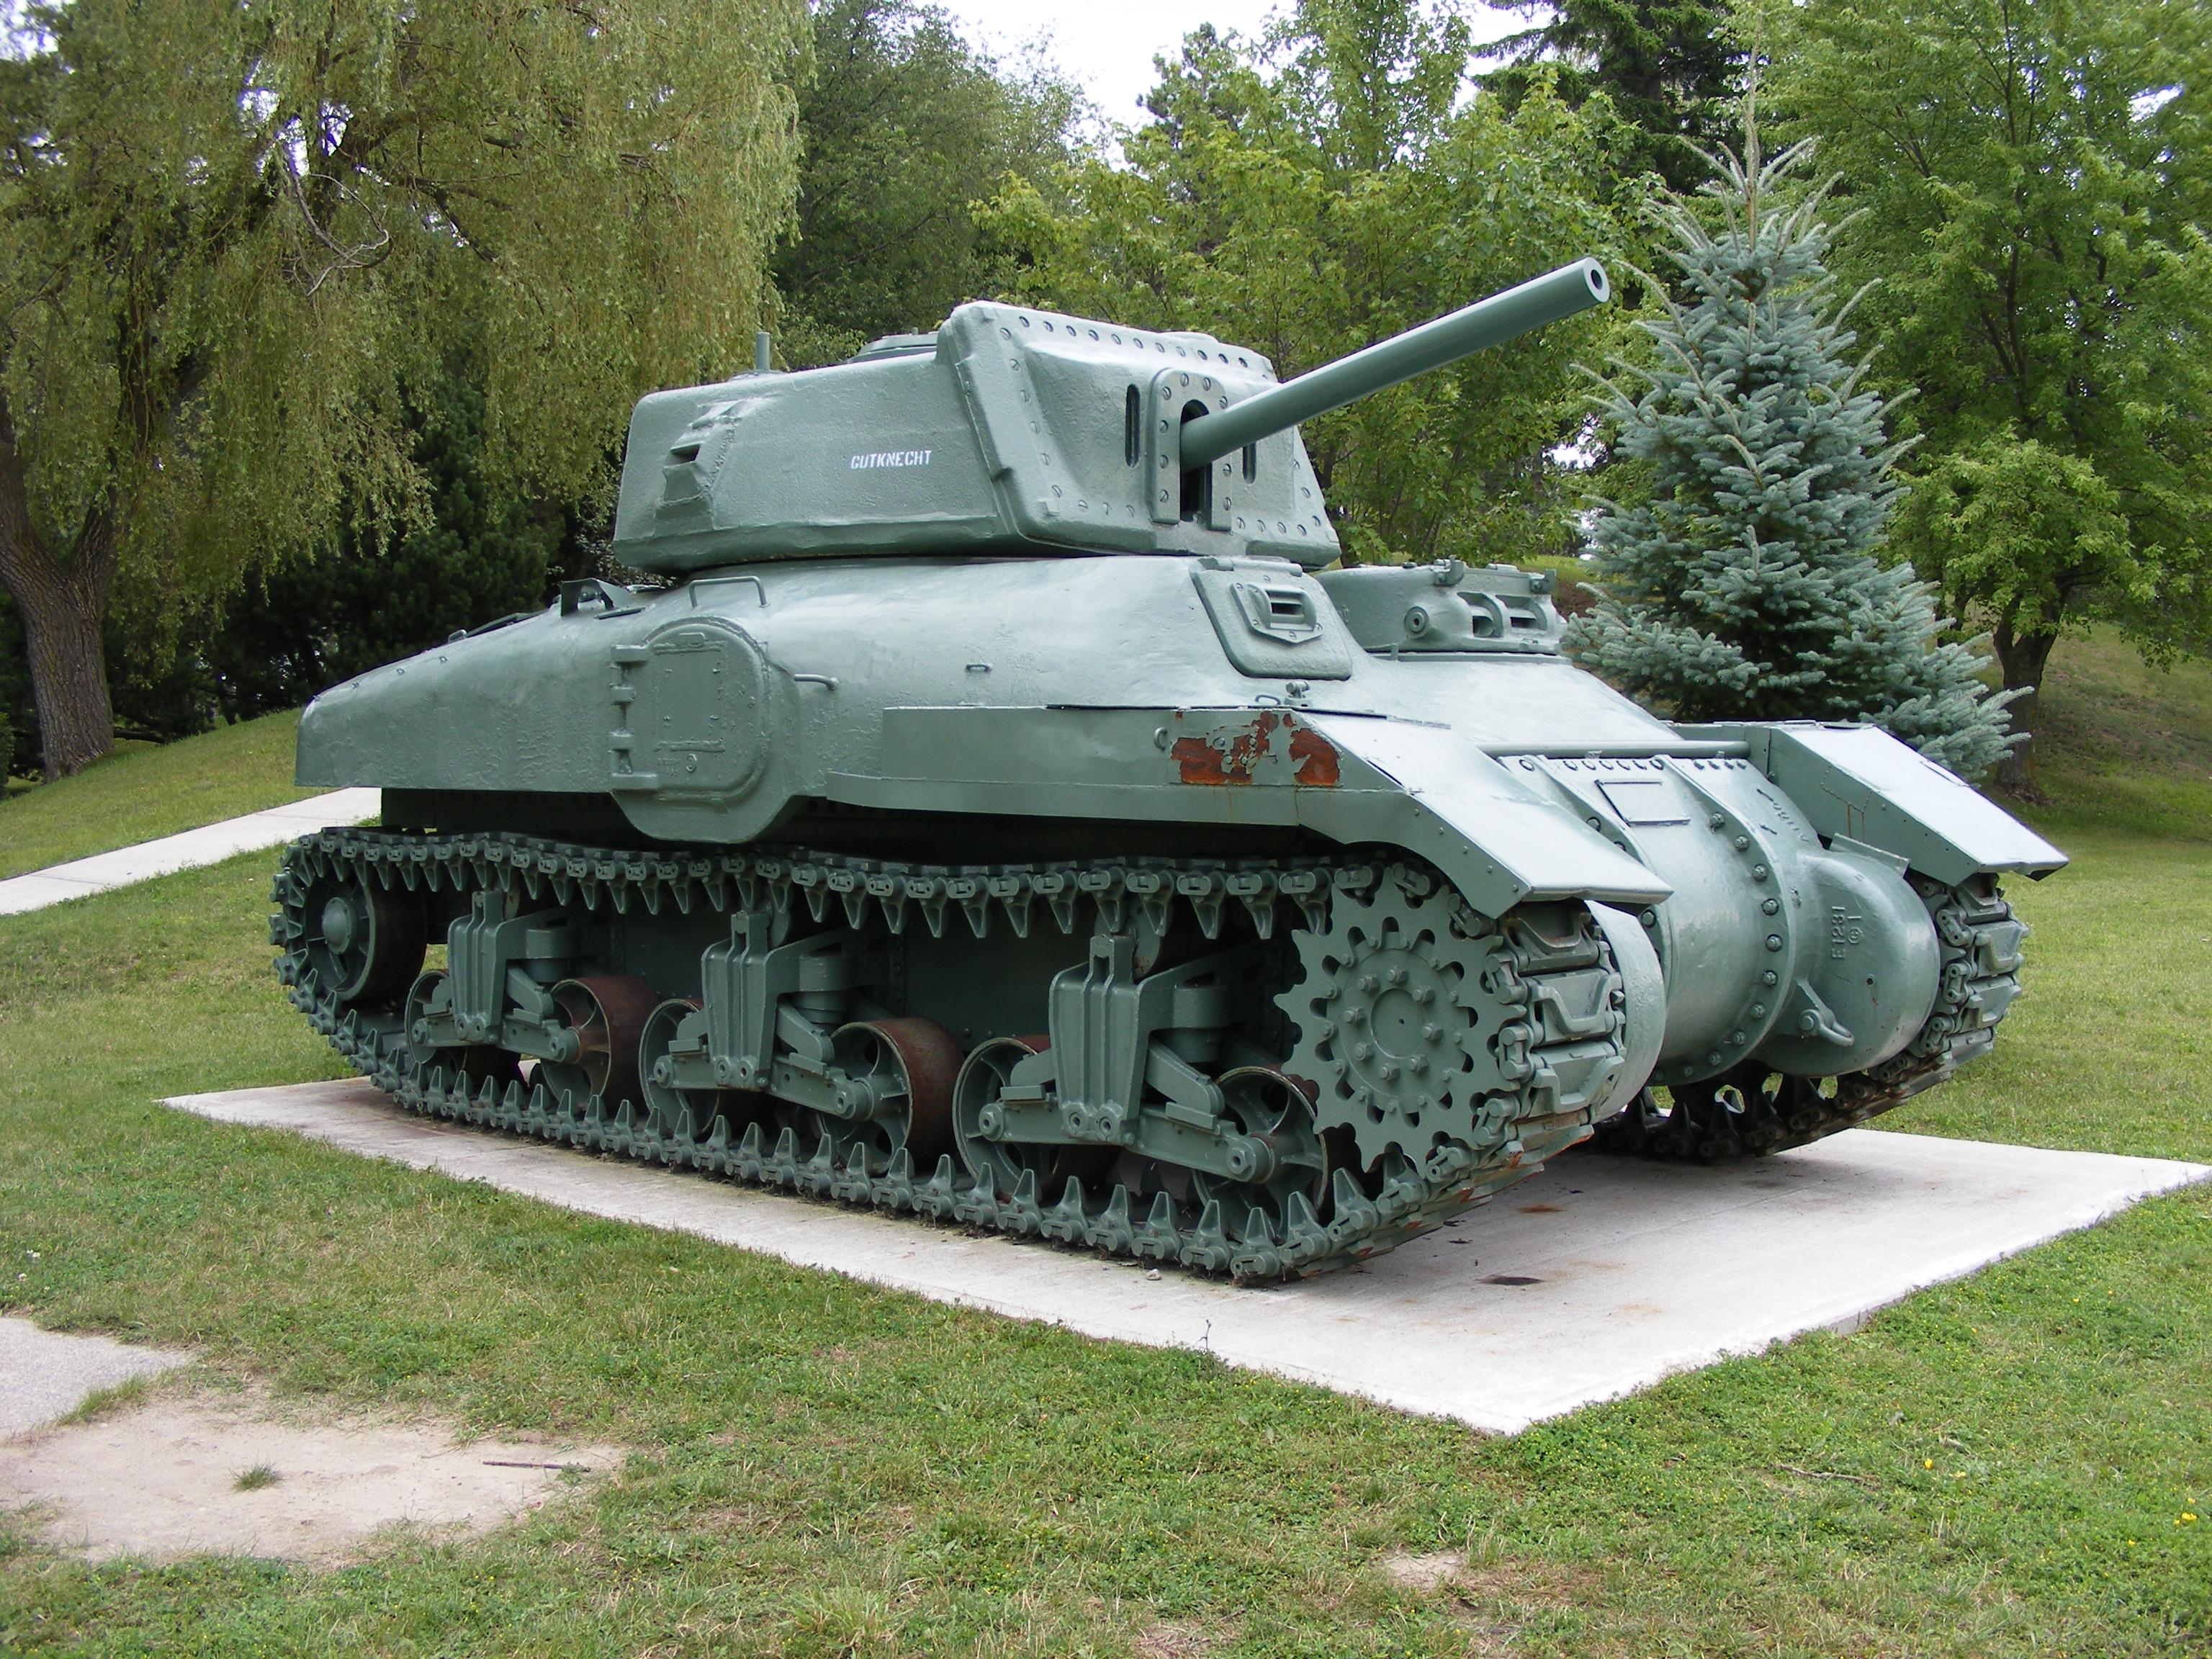 German 50 Mm Anti Tank Gun: File:Ram Tank CFB Borden 2009 3.jpg